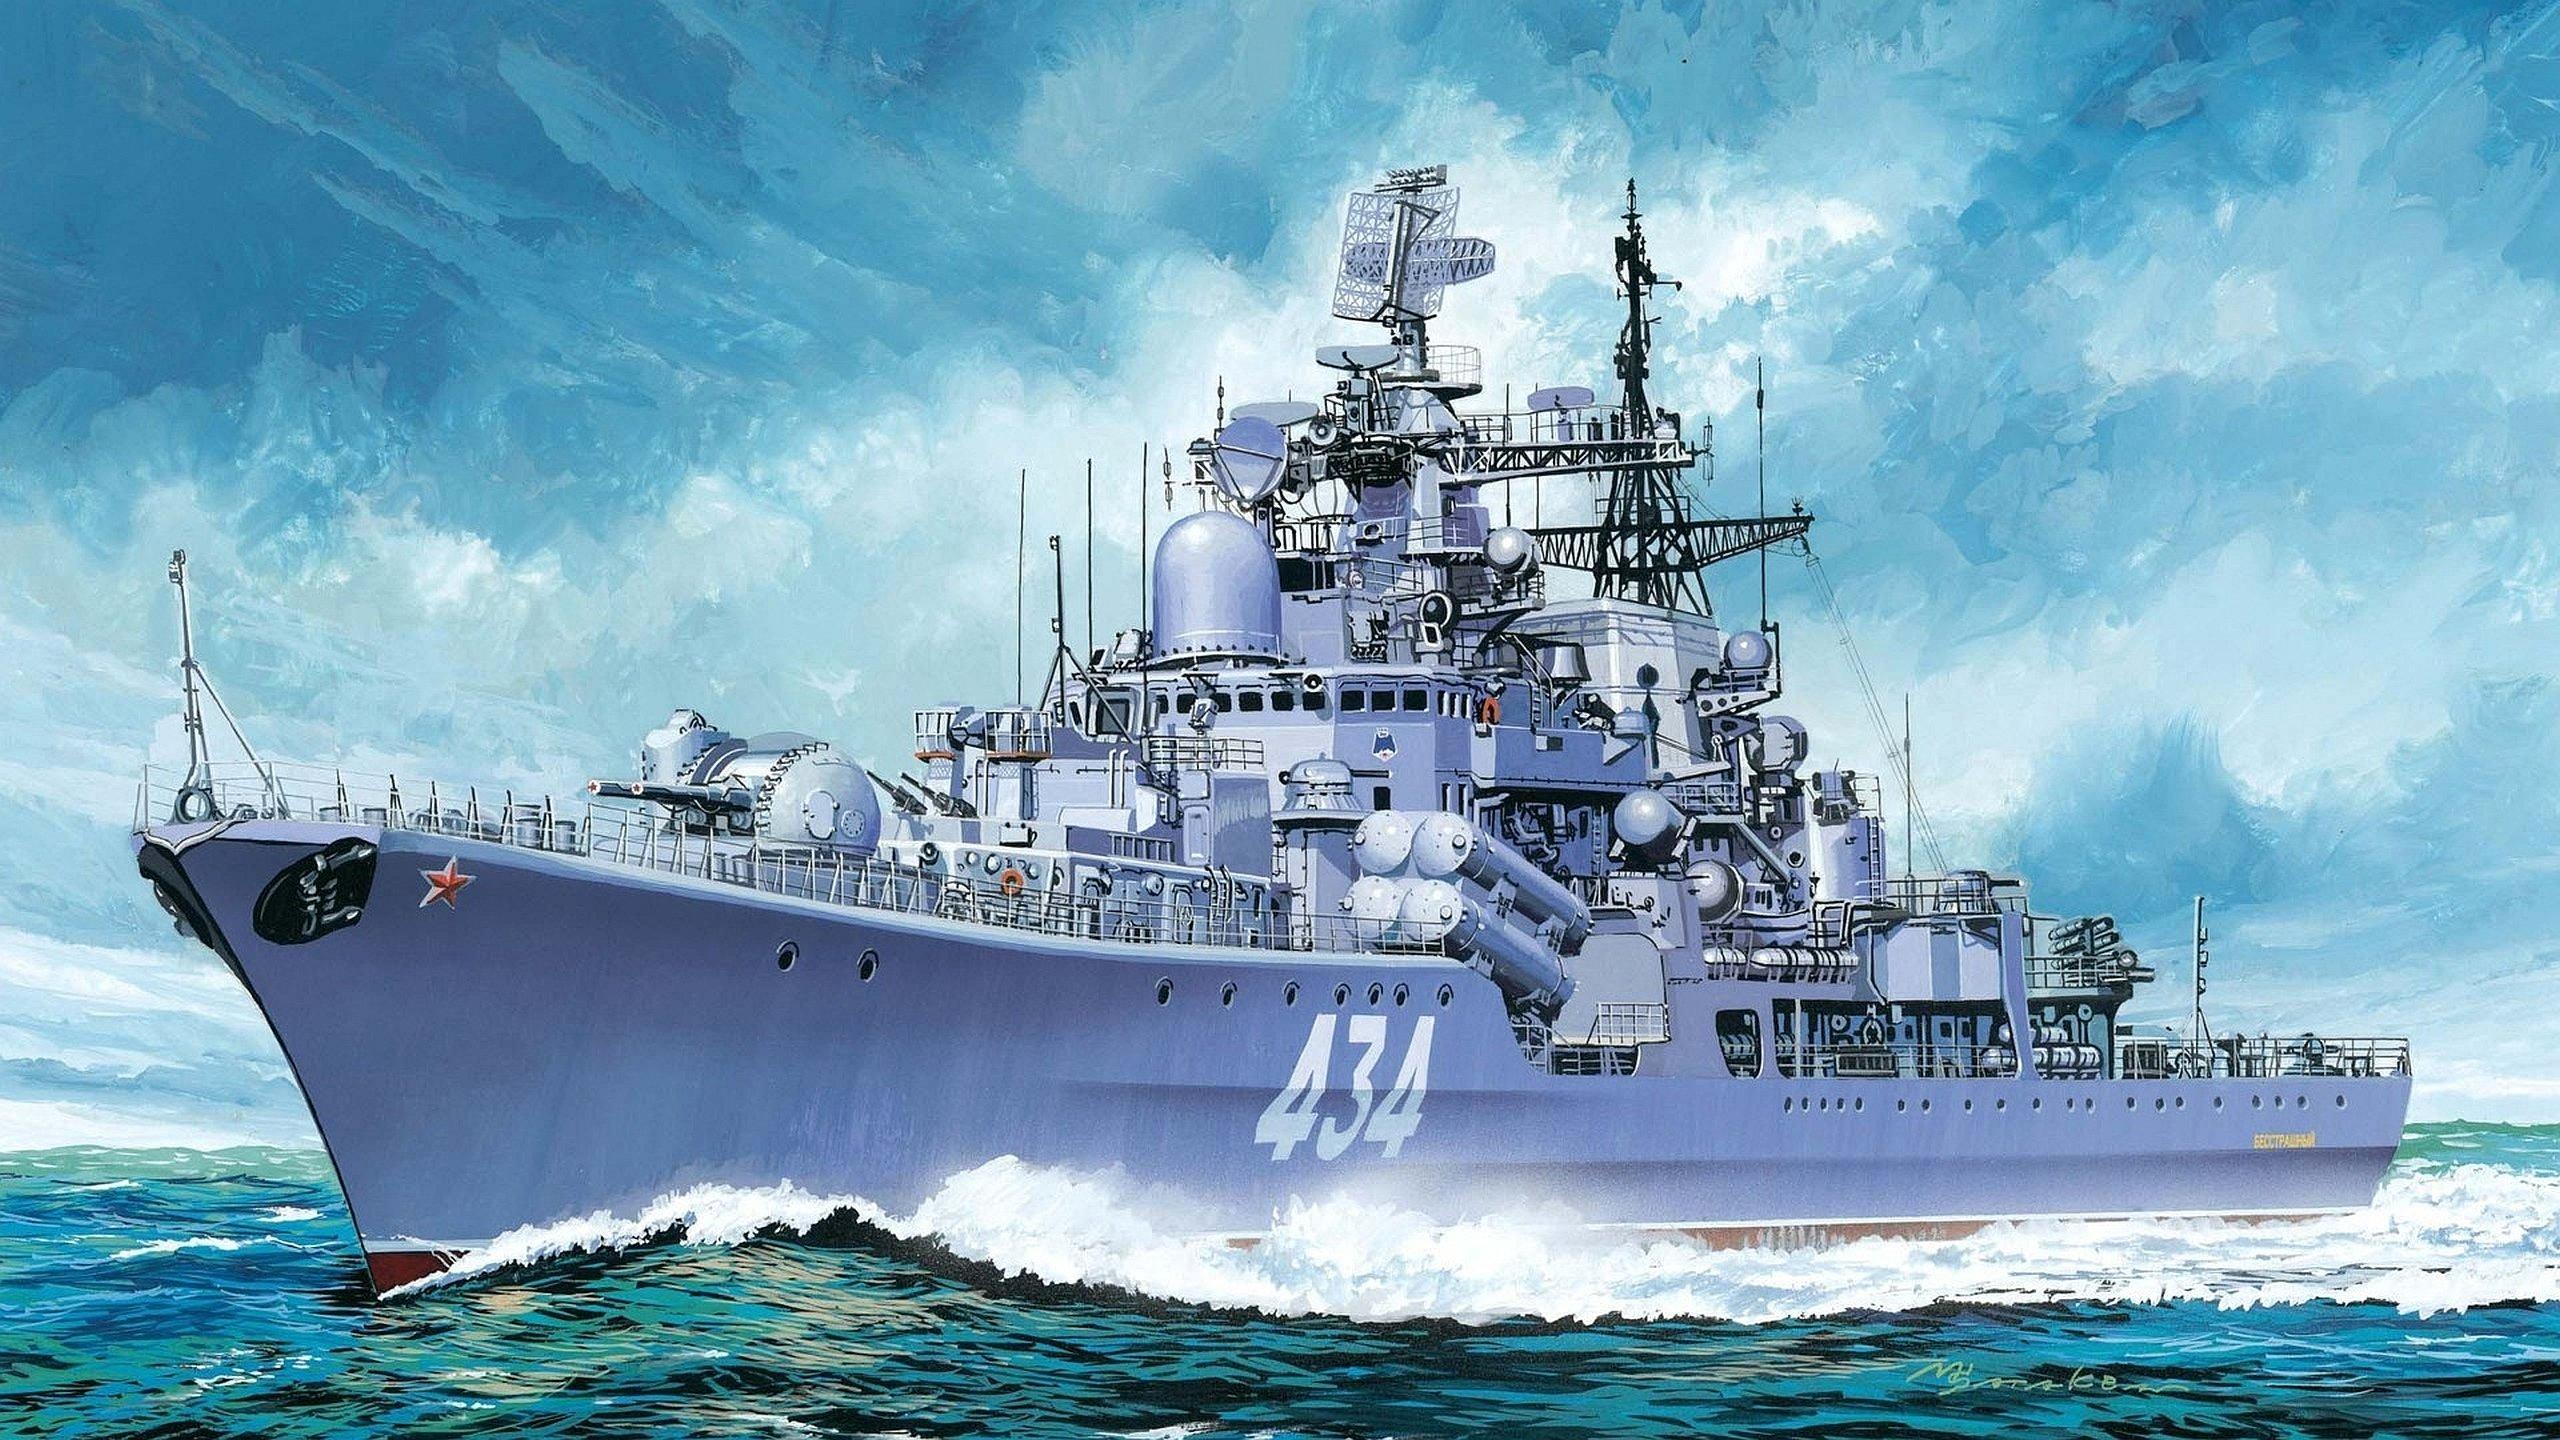 Free Russian Navy High Quality Wallpaper ID495600 For Hd 2560x1440 Desktop